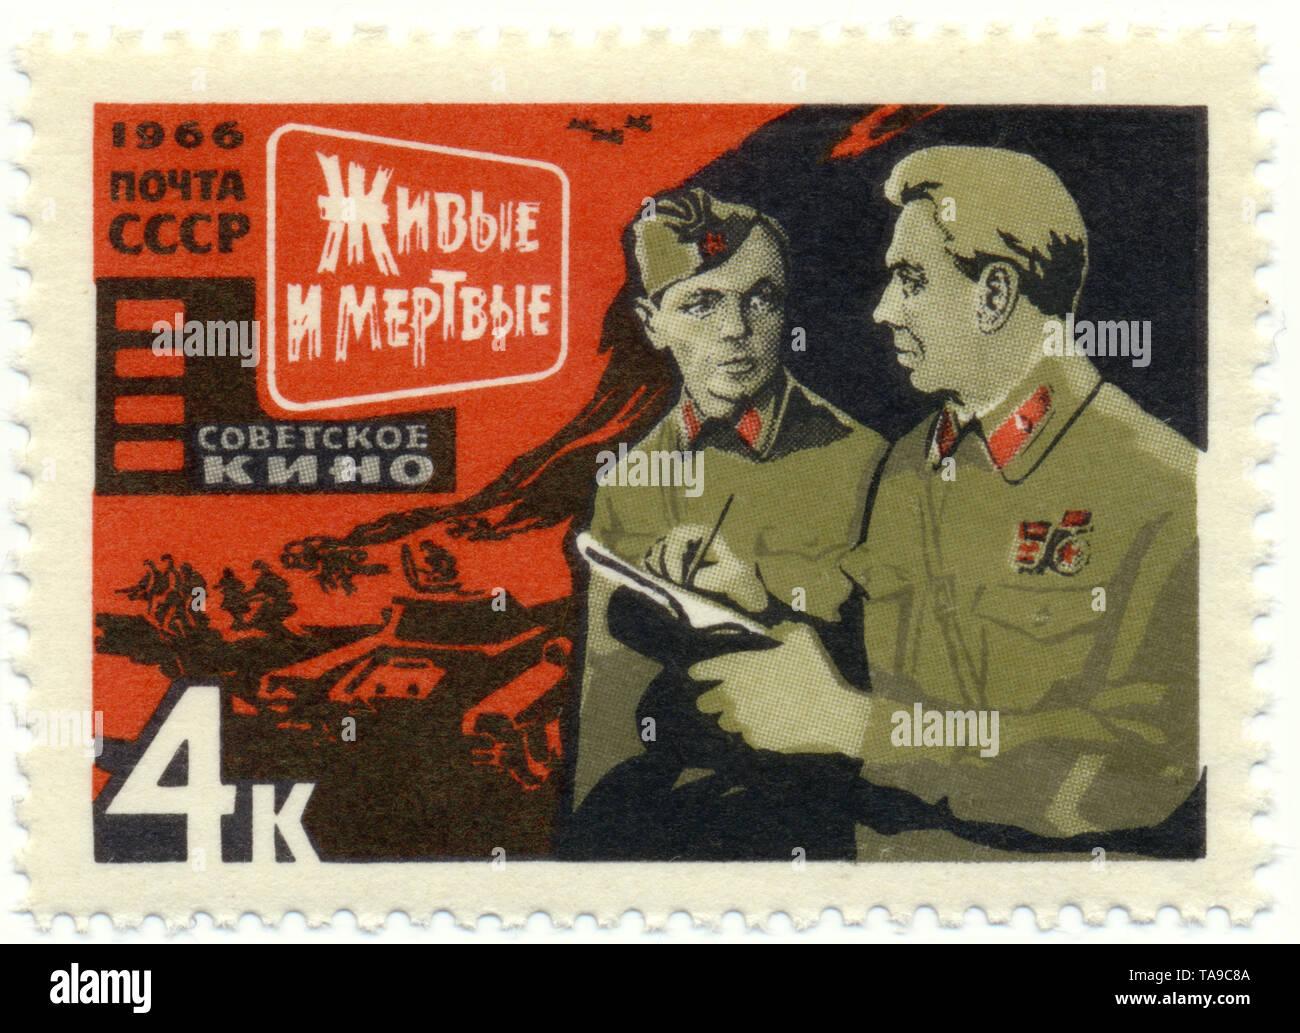 Historic postage stamps of the USSR, political motives, Historische Briefmarke, Szene aus dem Film 'The Living and the Dead' von A. Stolper, 1965, UDSSR - Stock Image